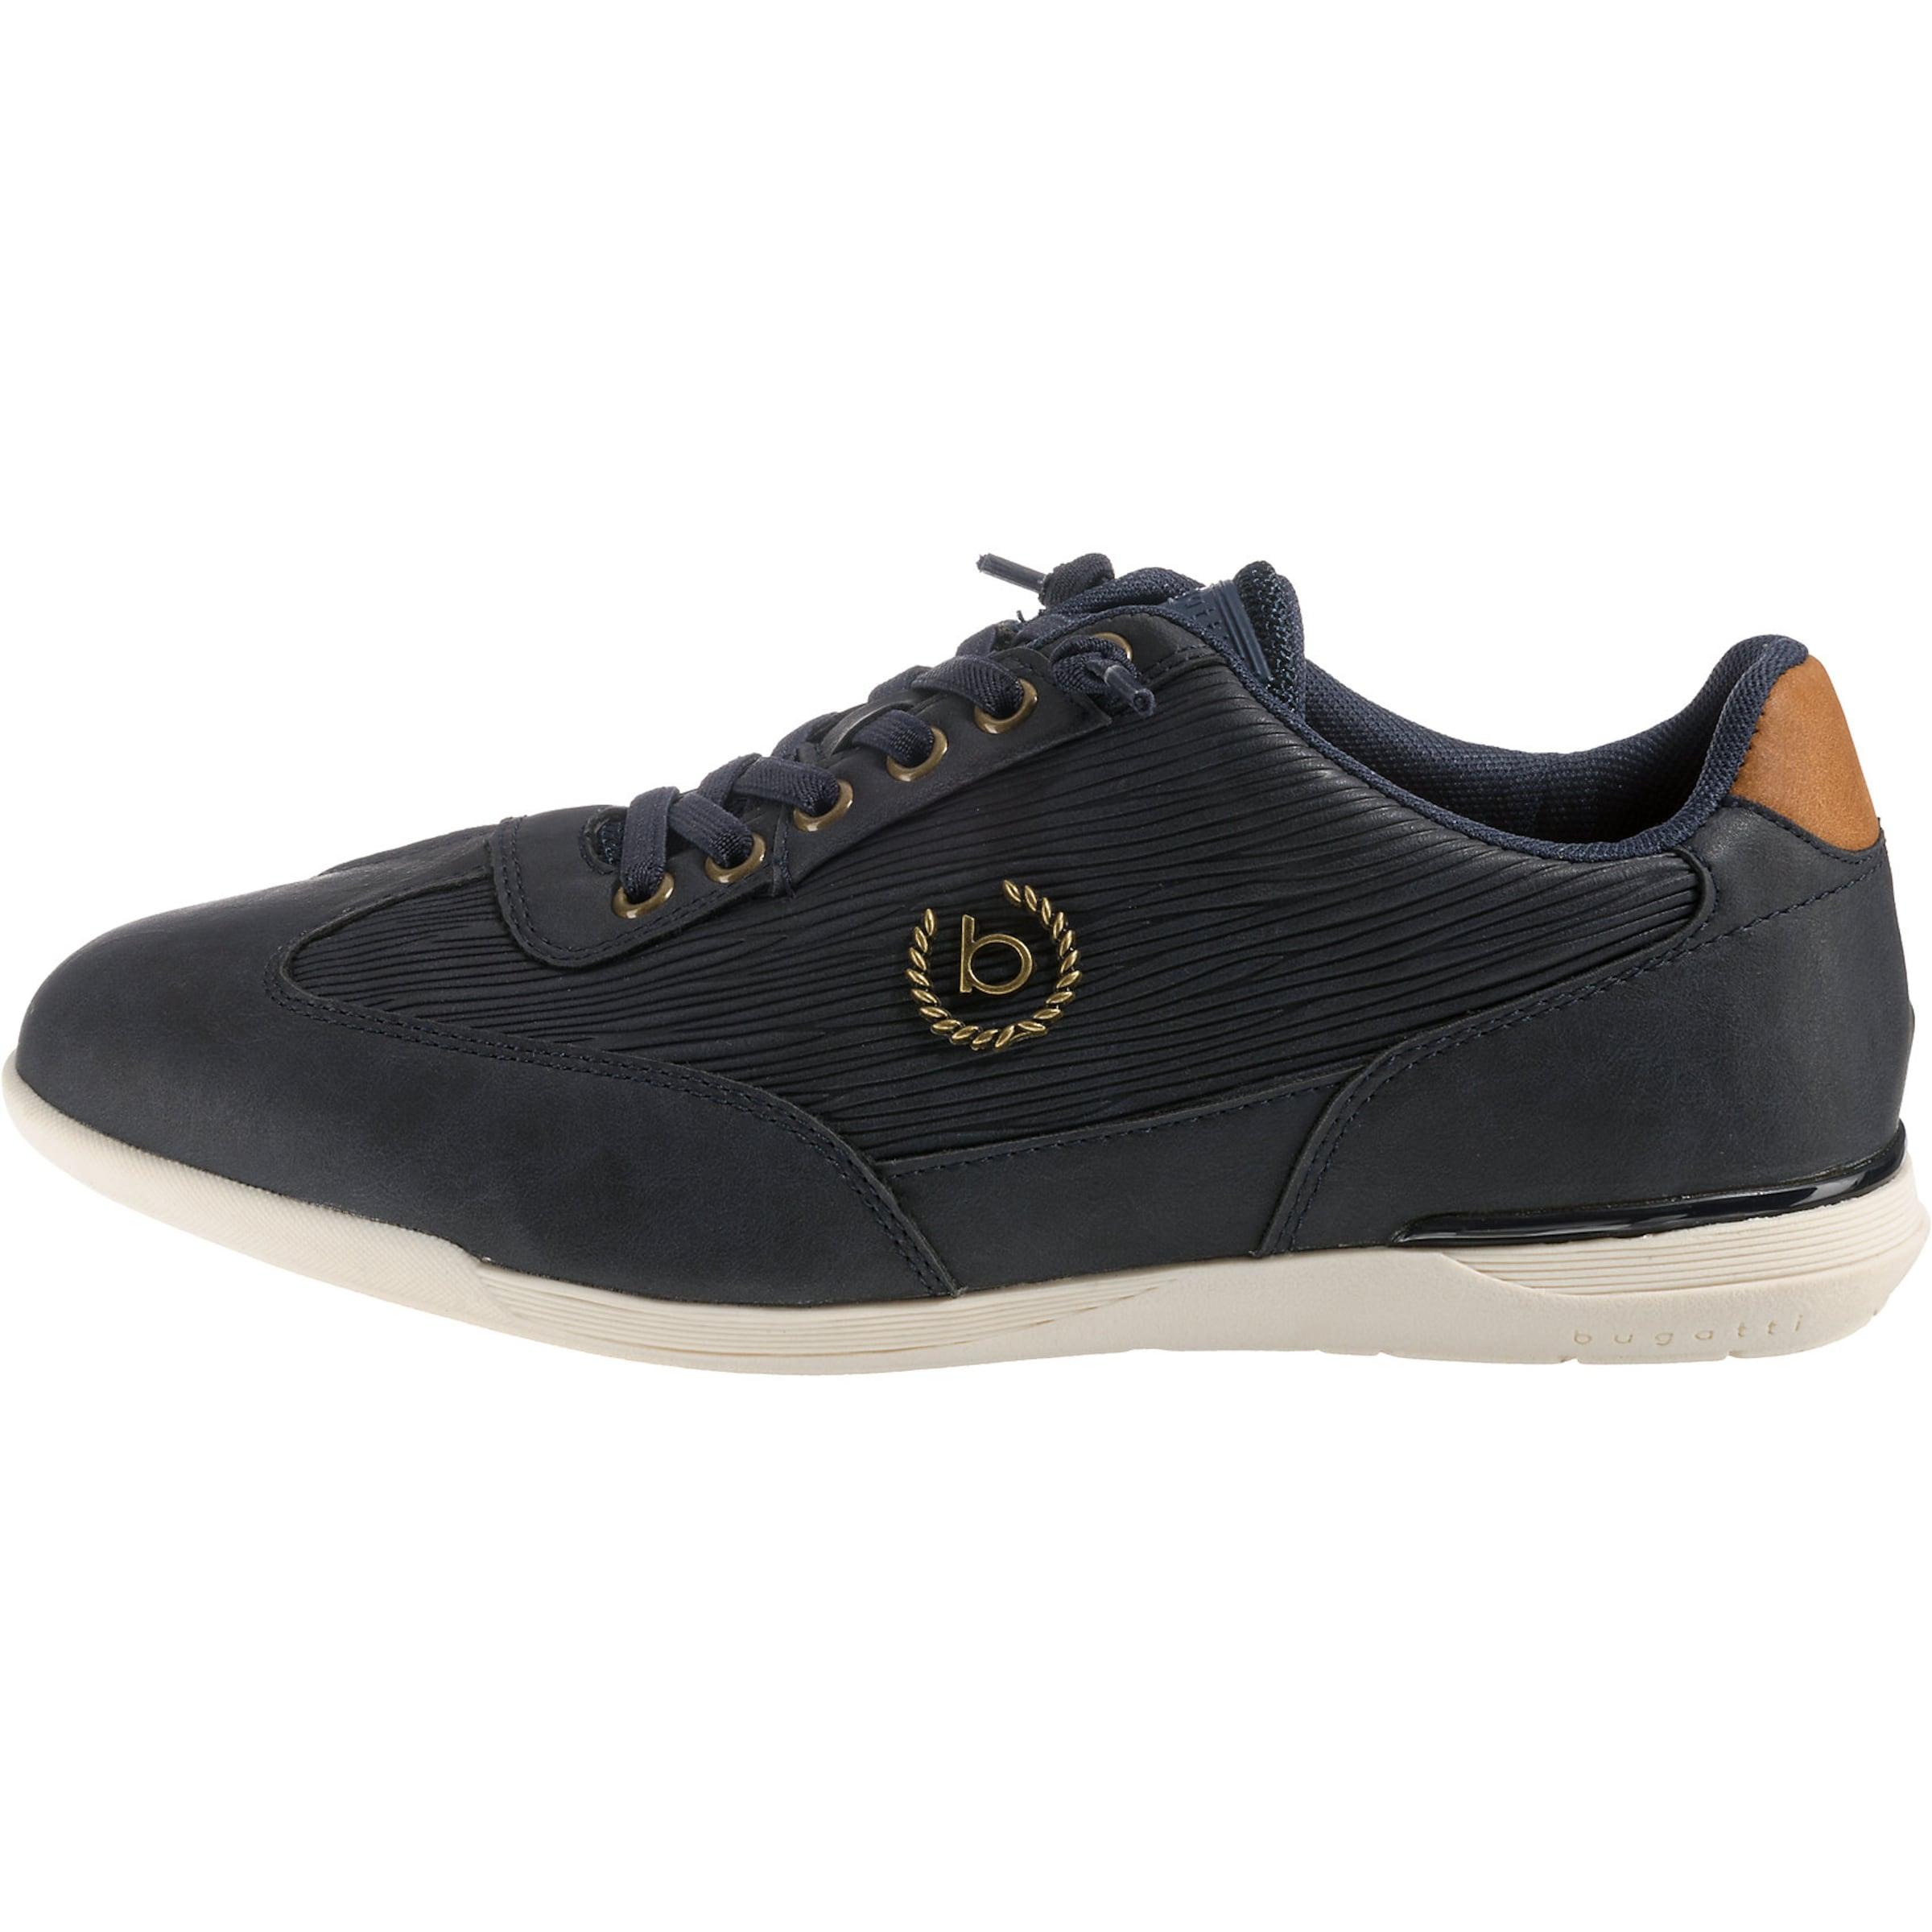 Evo' In Navy 'river Bugatti Sneaker 6vfb7gyY